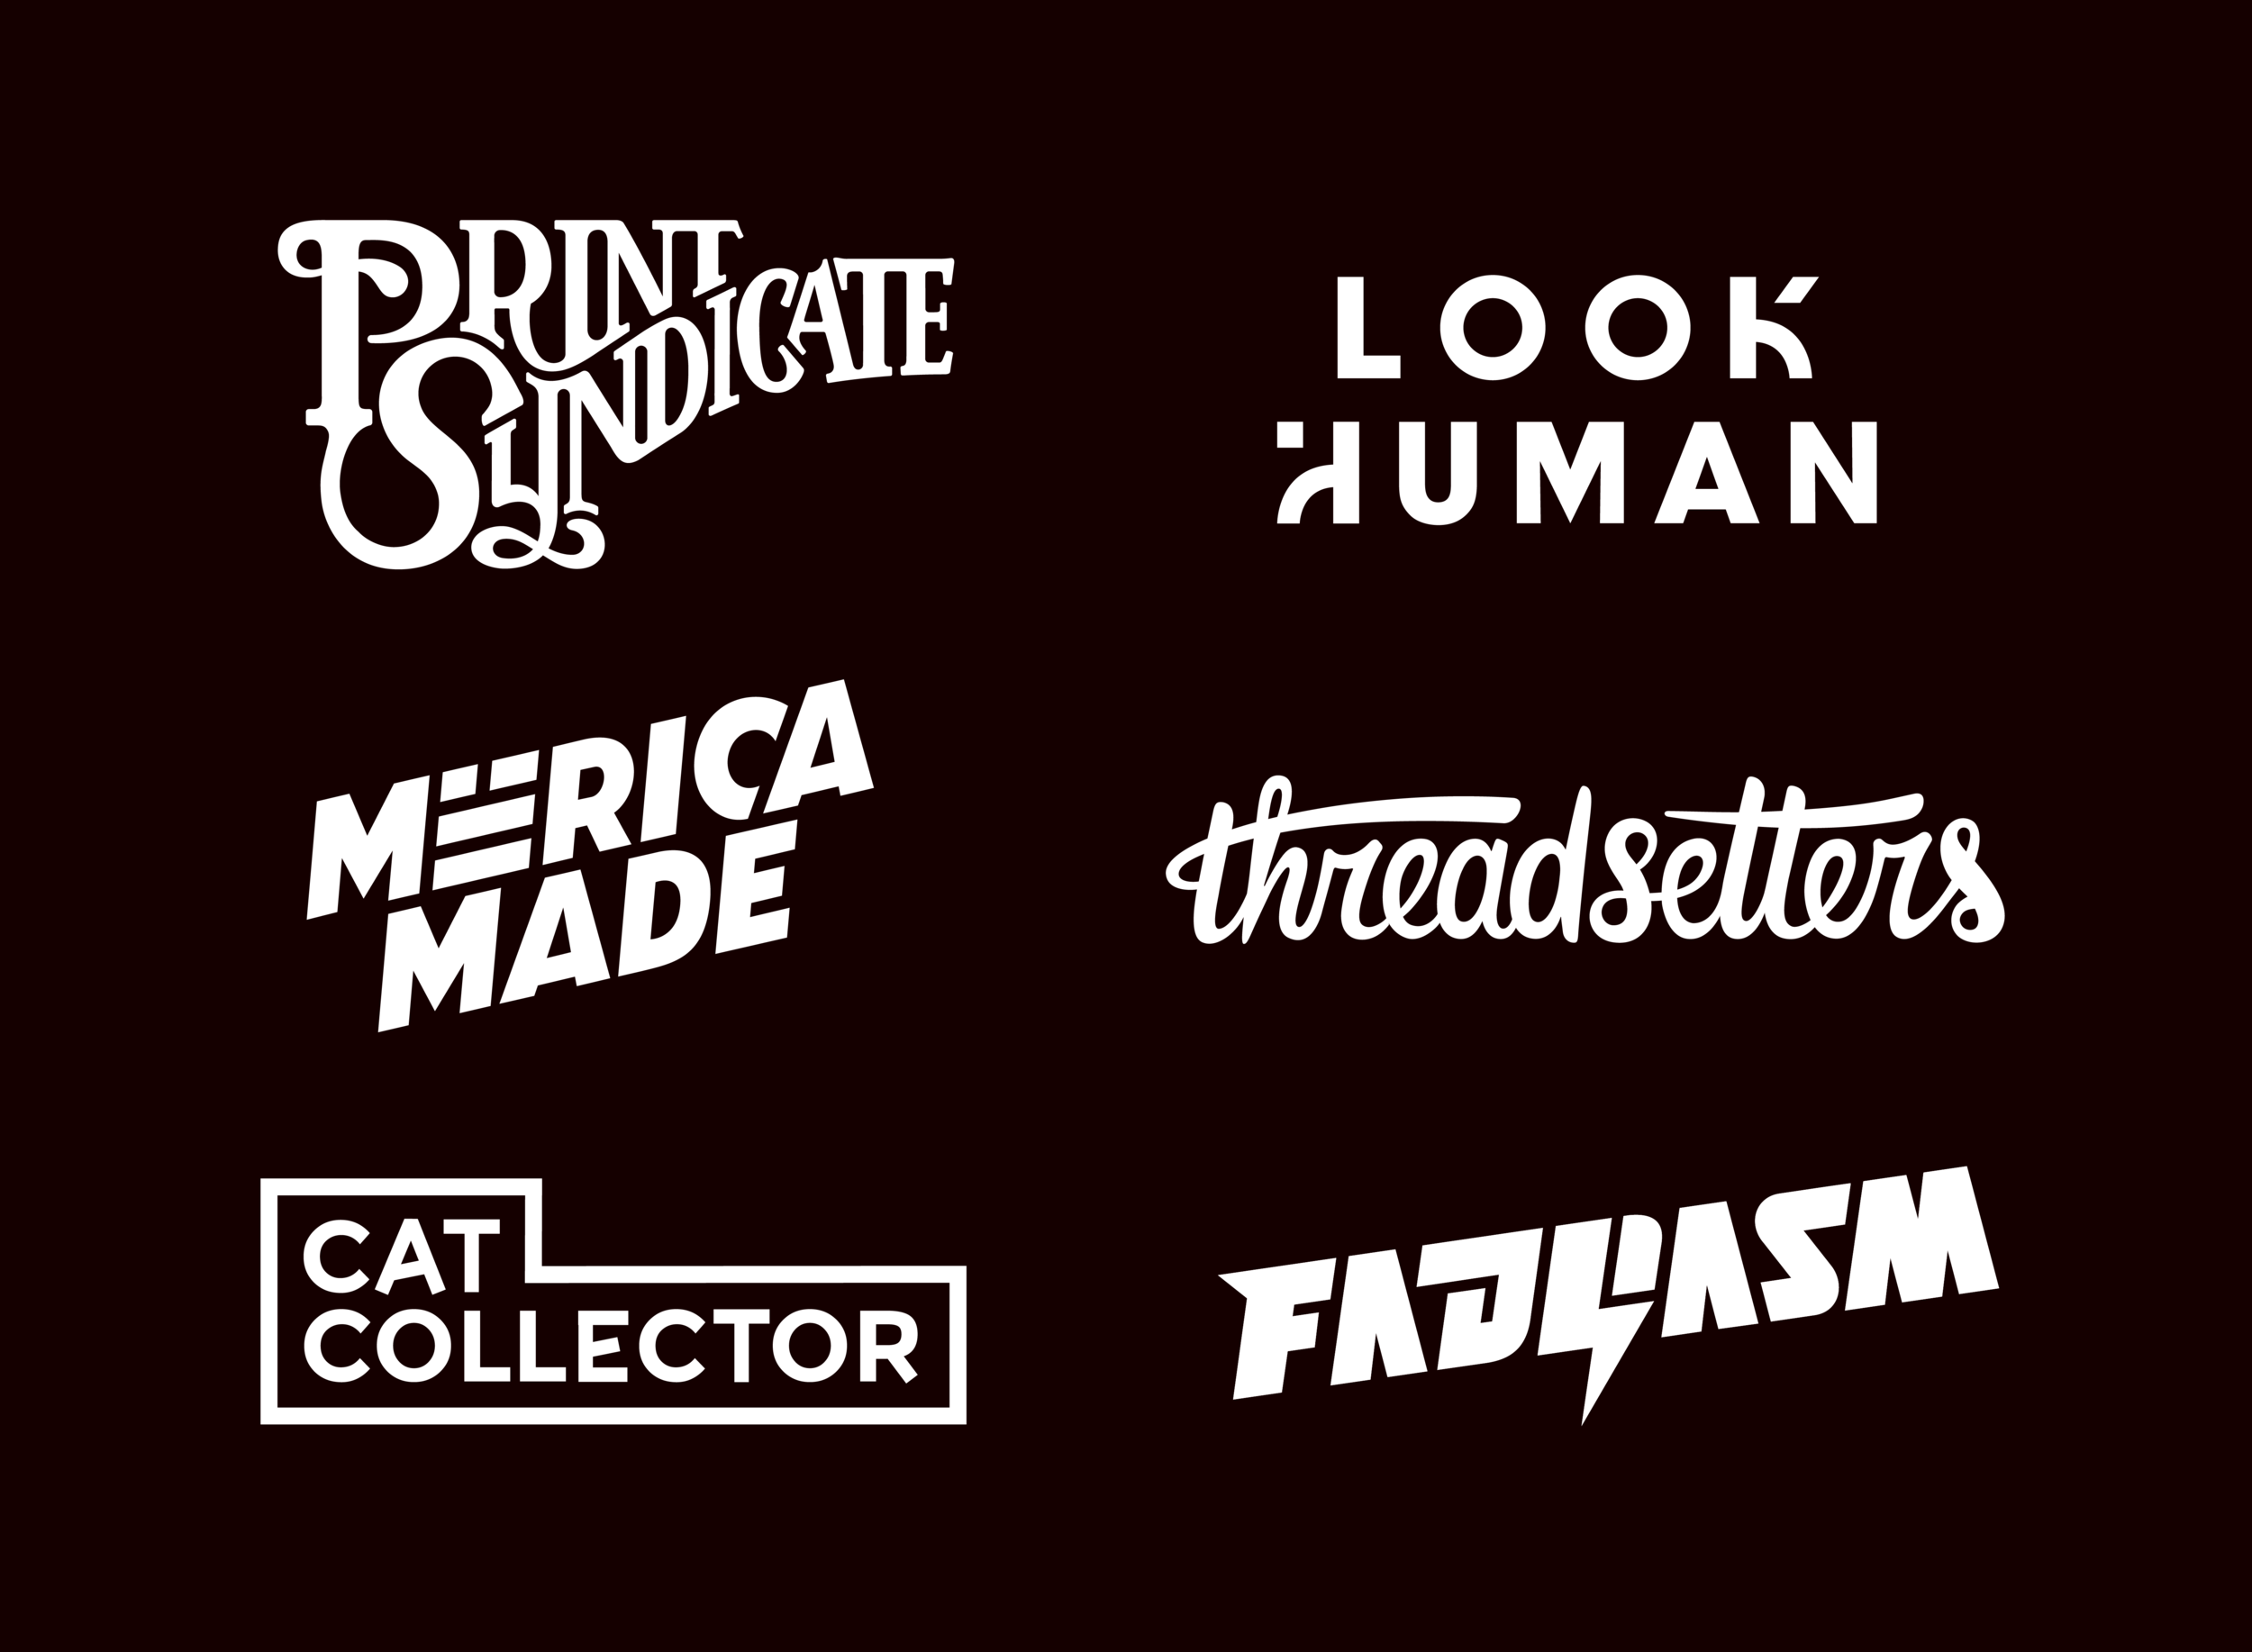 print syndicate brand logos